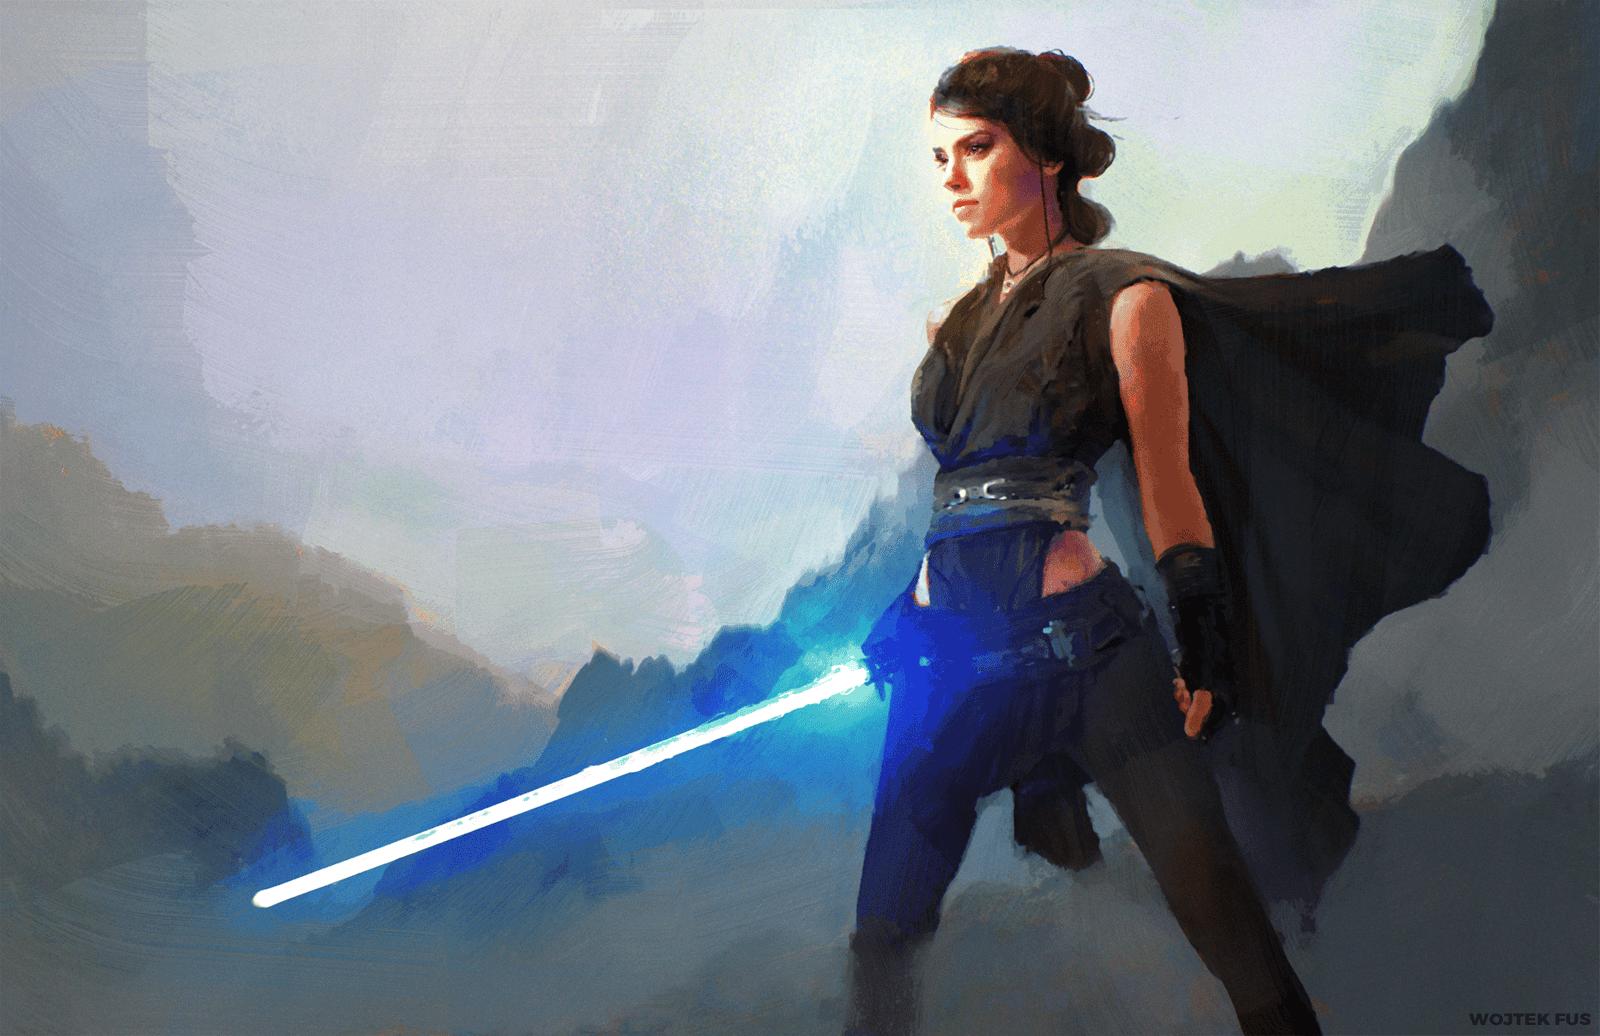 Star Wars Episode VII The Force Awakens Wallpaper 098